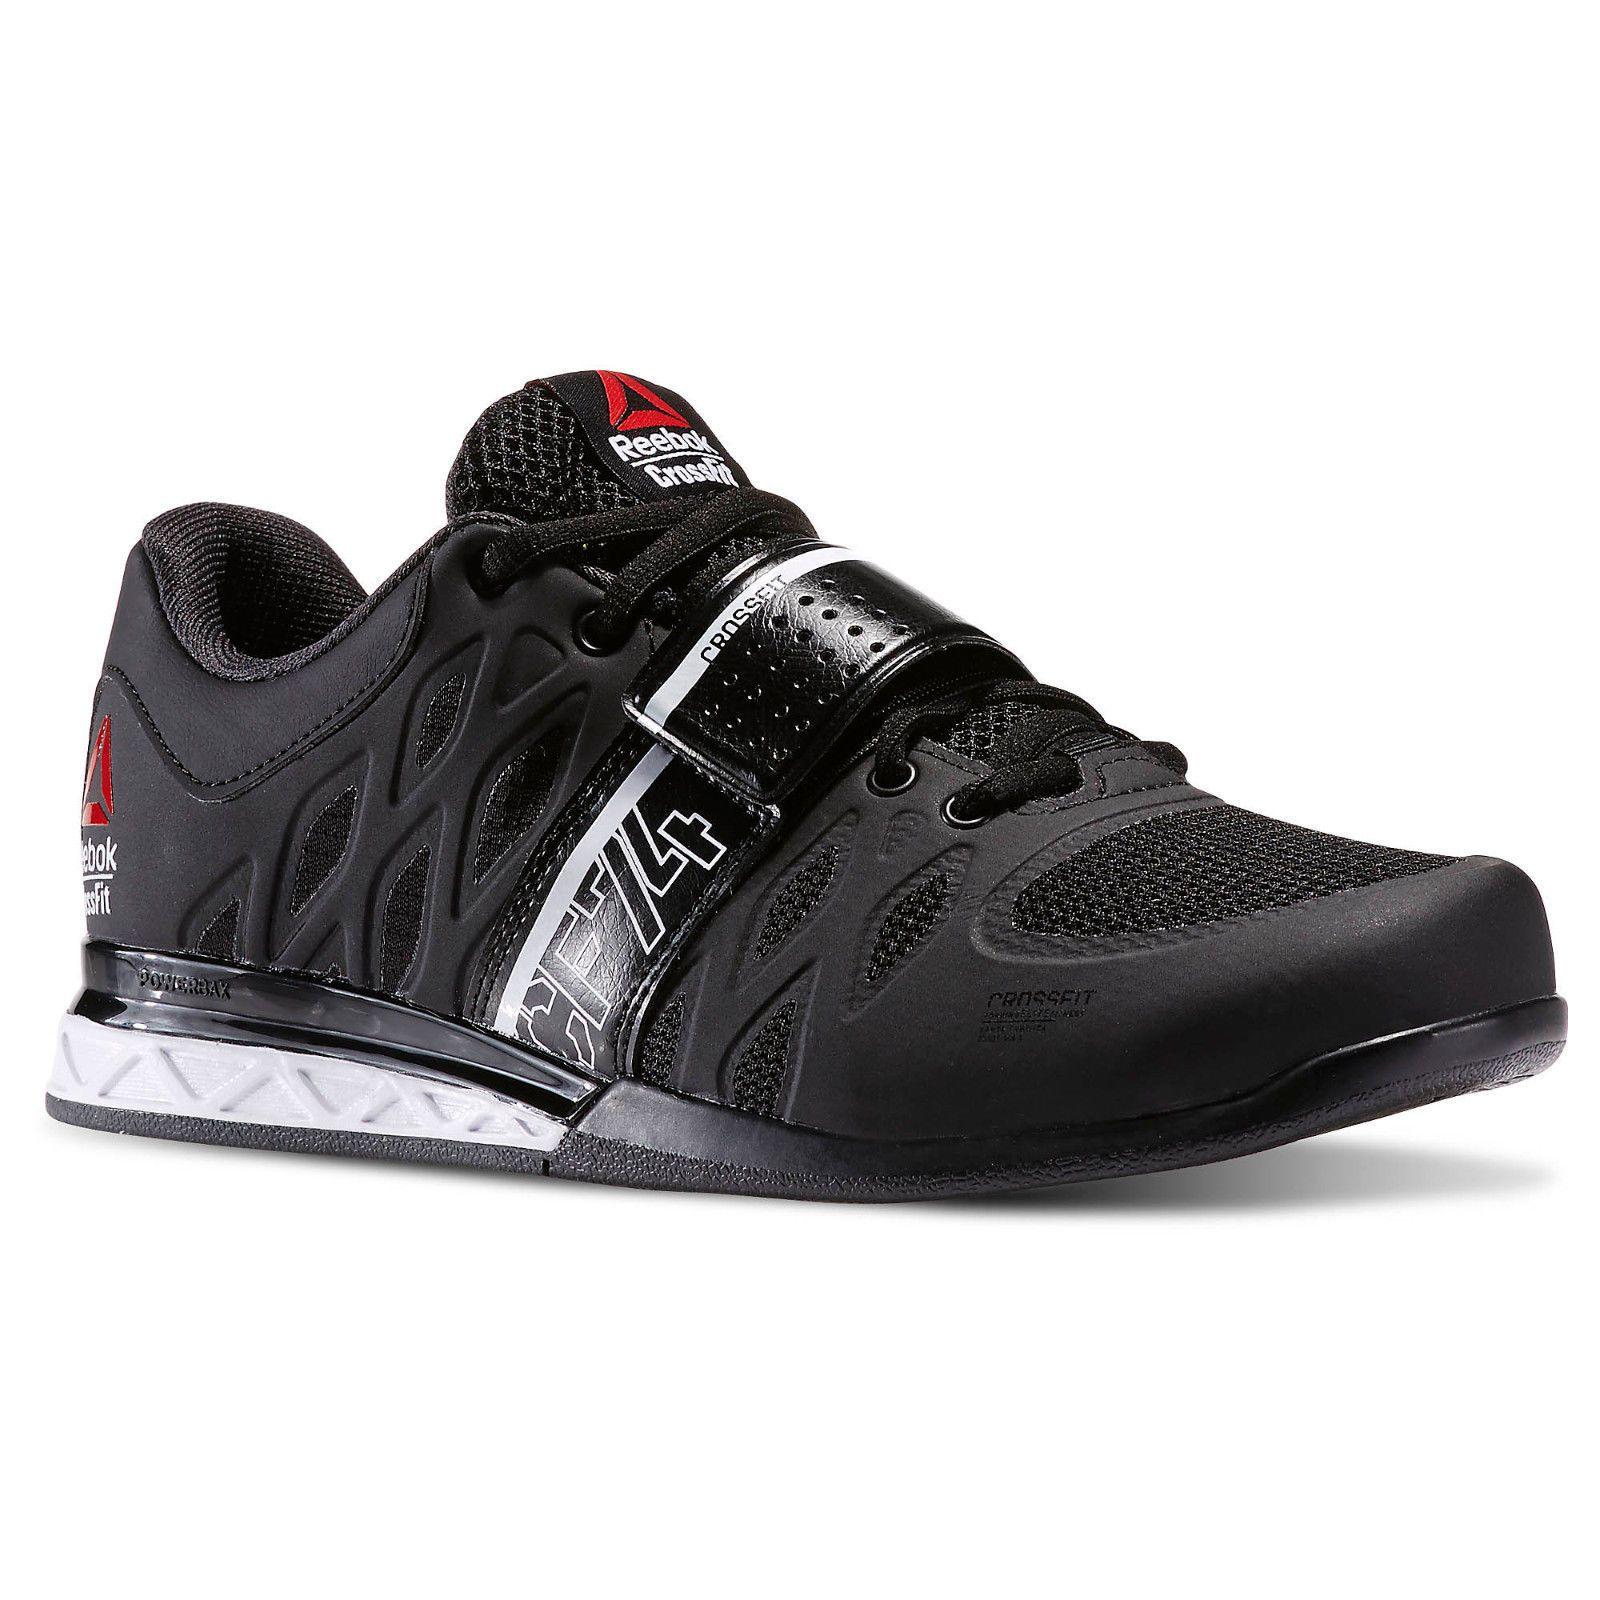 5234ae0d260004 New Women s REEBOK Crossfit Lifter 2.0 - V65911 - Black Cross Training  Sneakers in Clothing